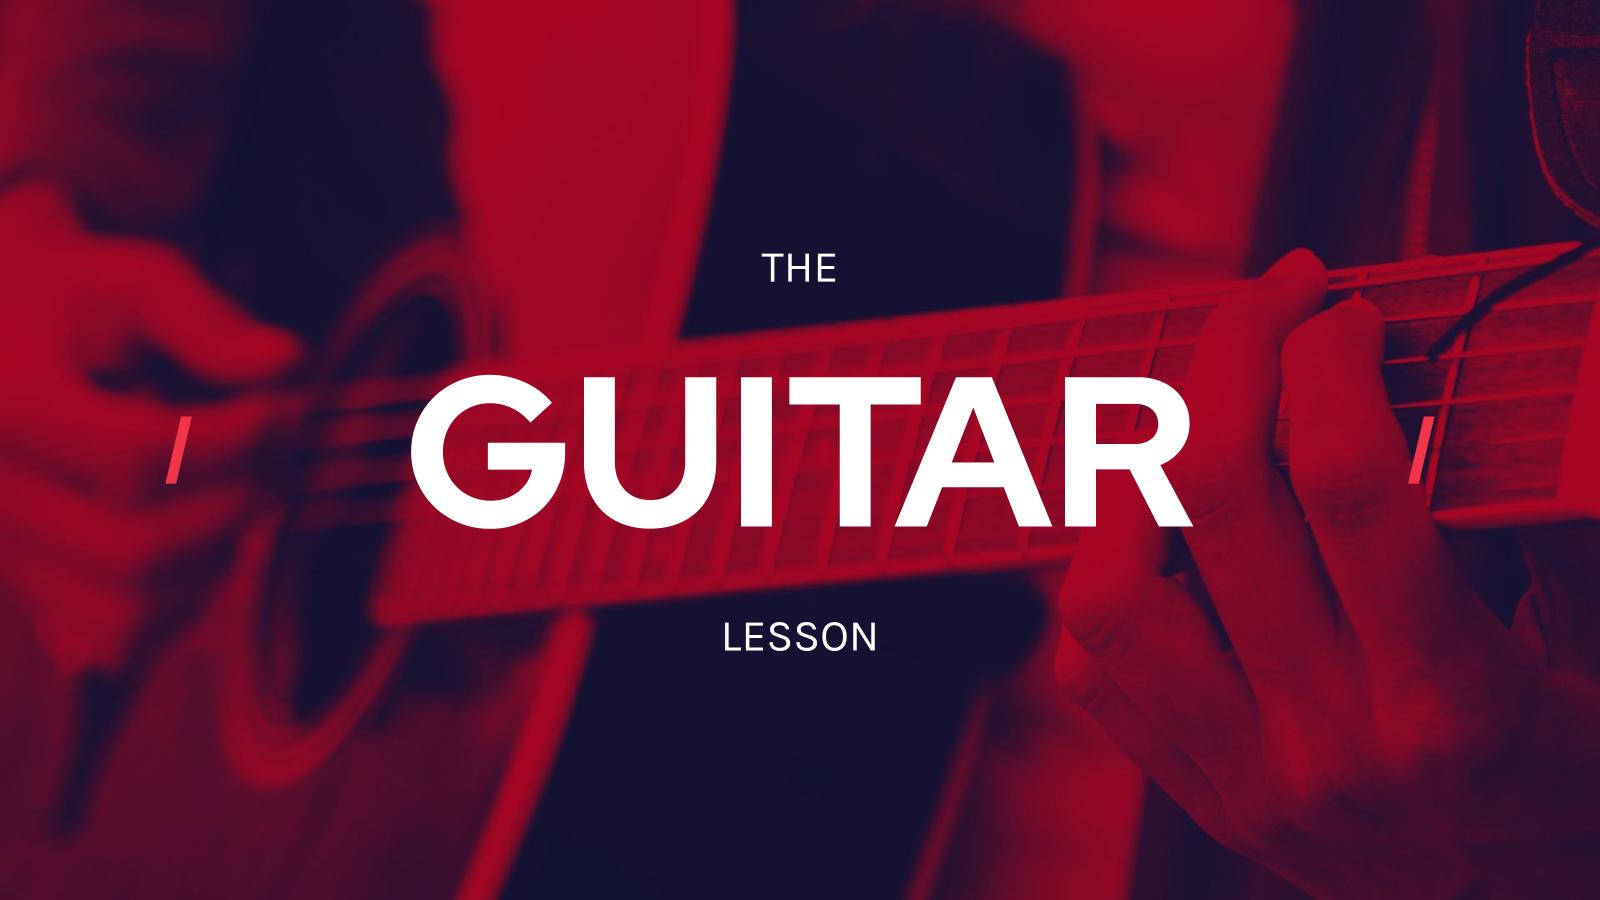 Guitar Lesson presentation template